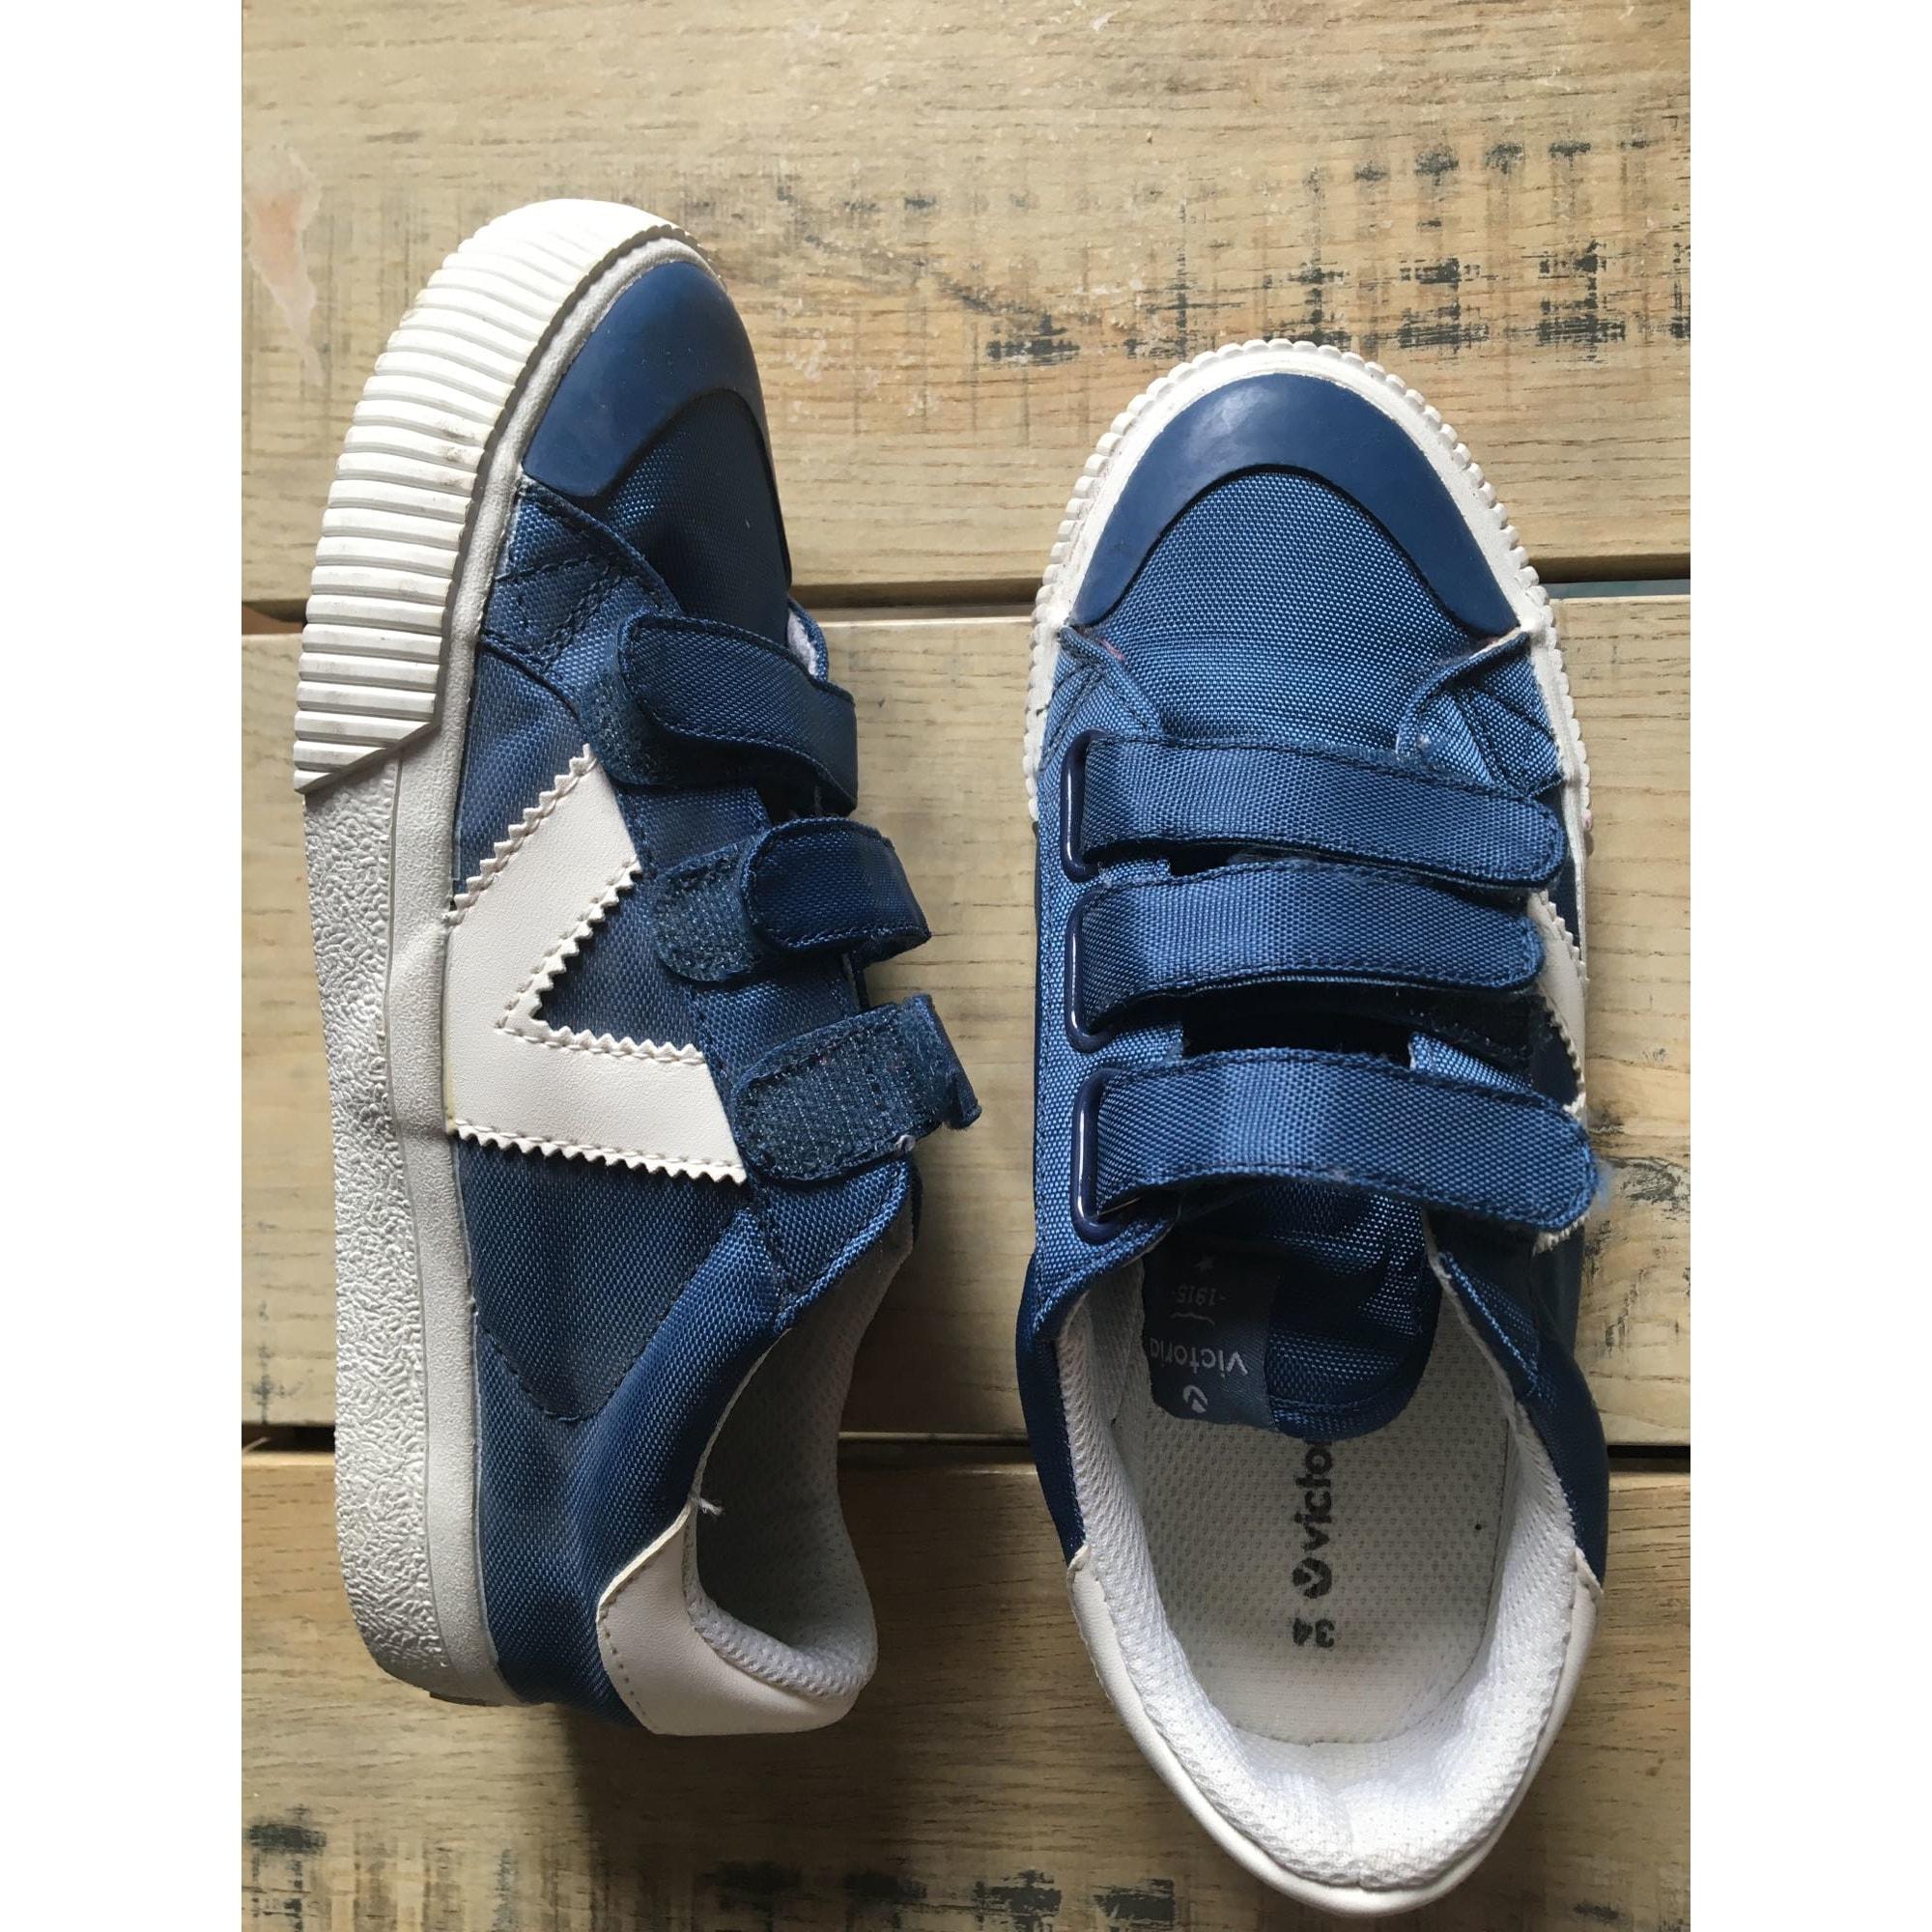 Baskets VICTORIA Bleu, bleu marine, bleu turquoise